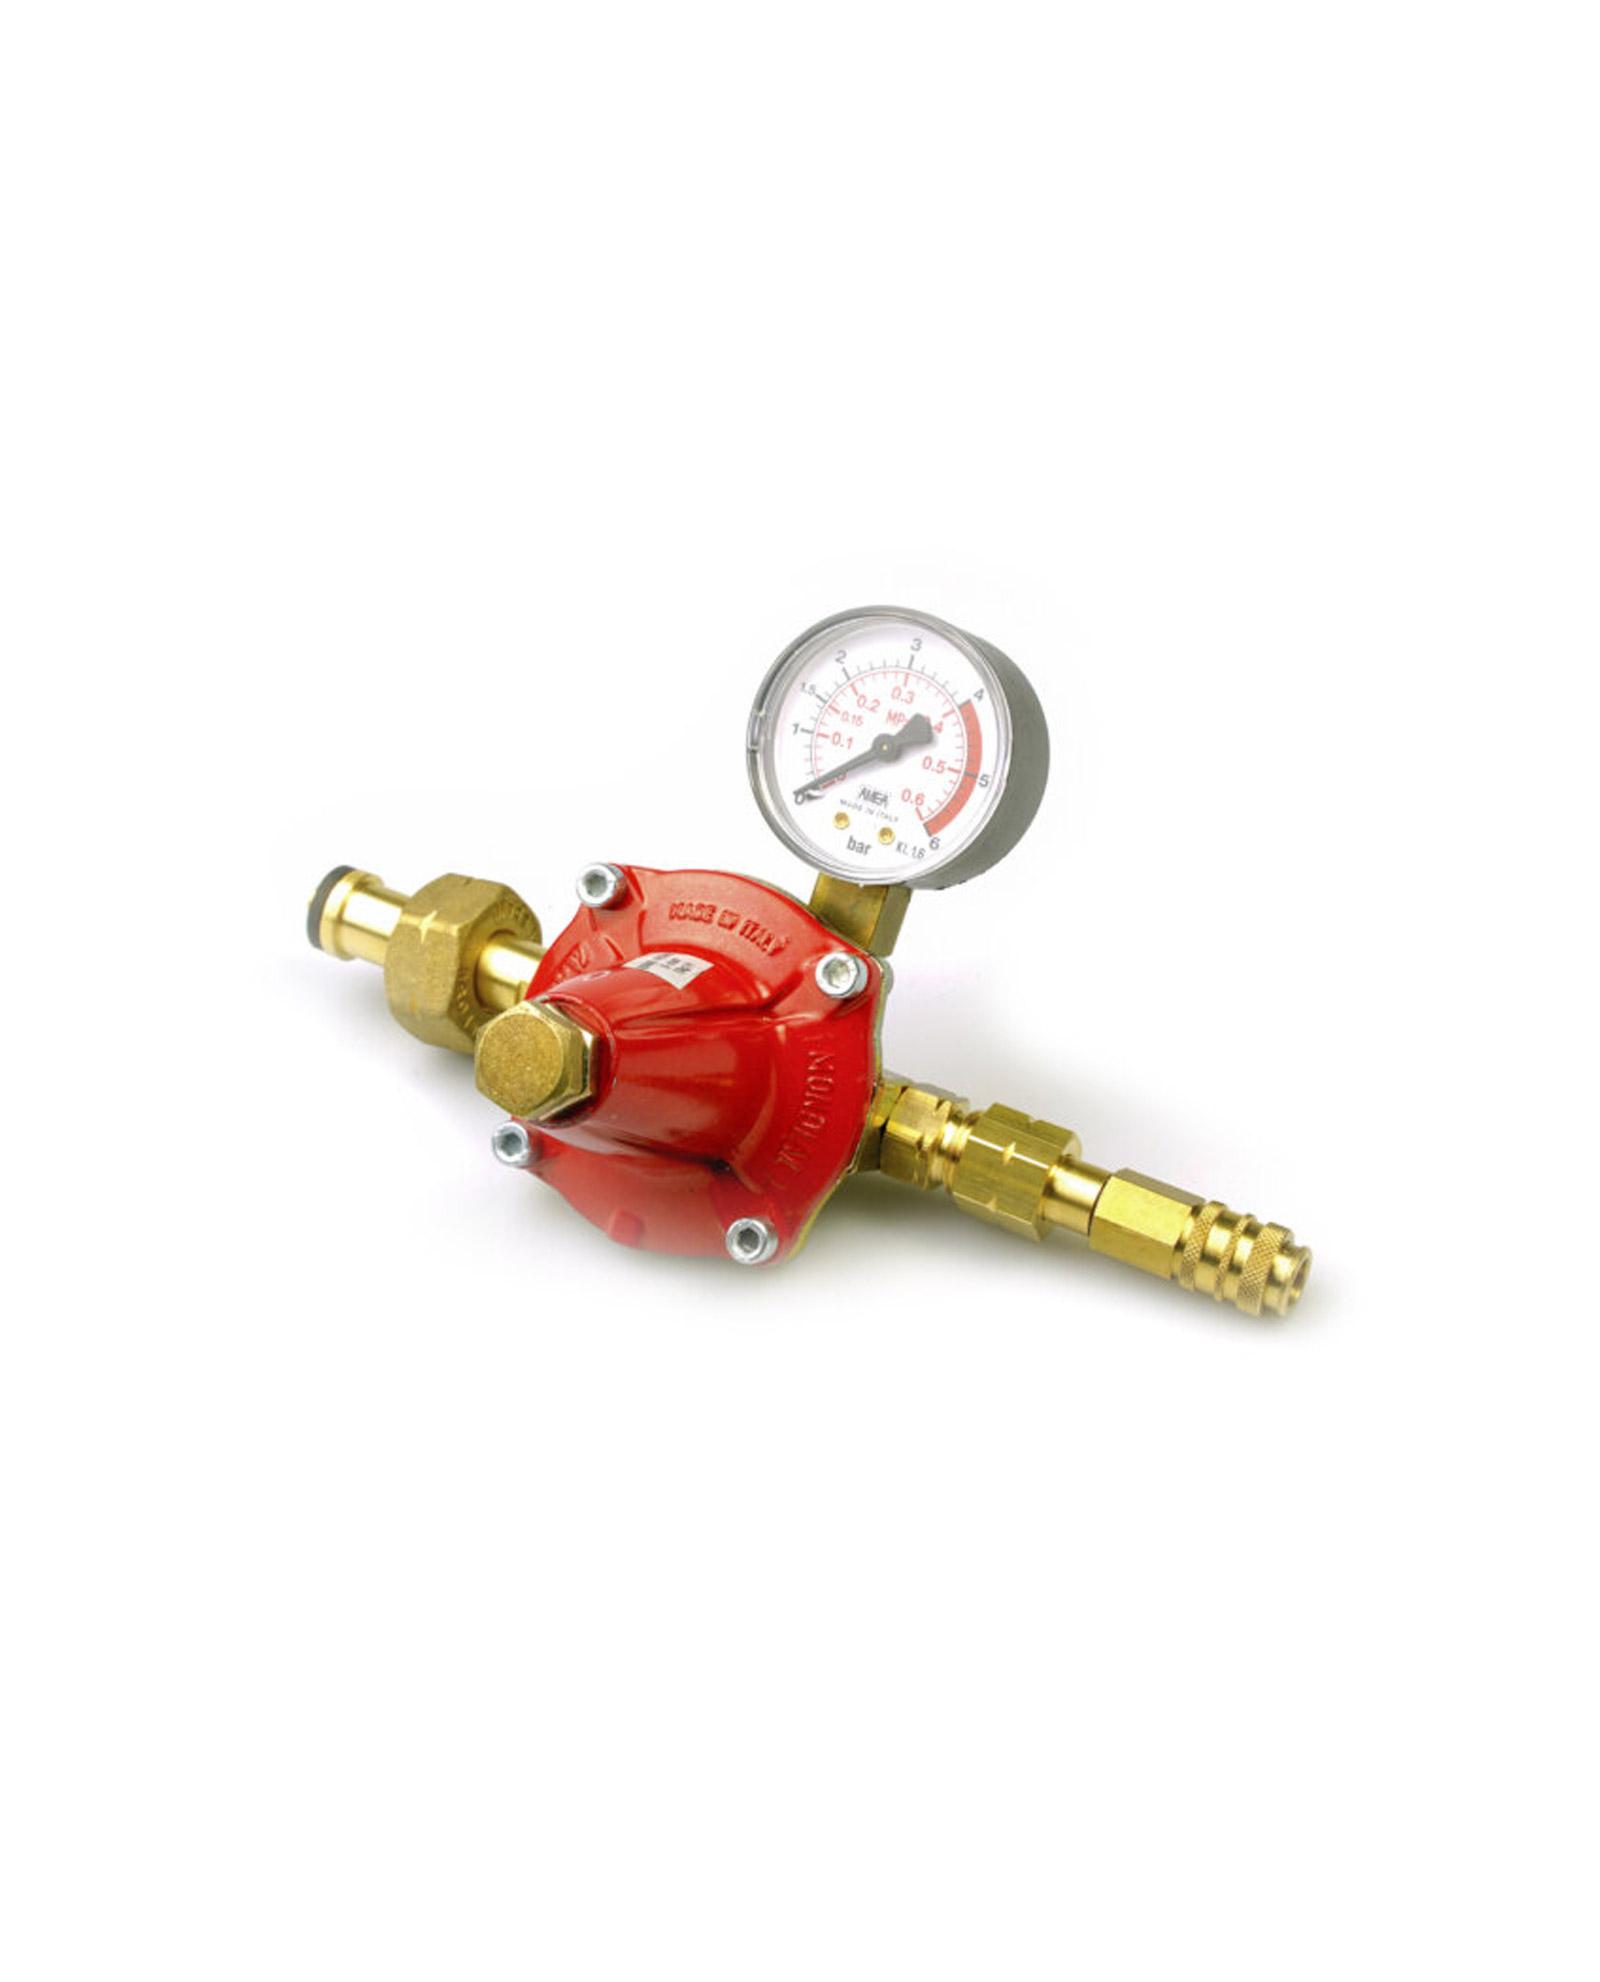 Magic Fx Mfx1202 Propane Gas Reducer Quick Connector Female